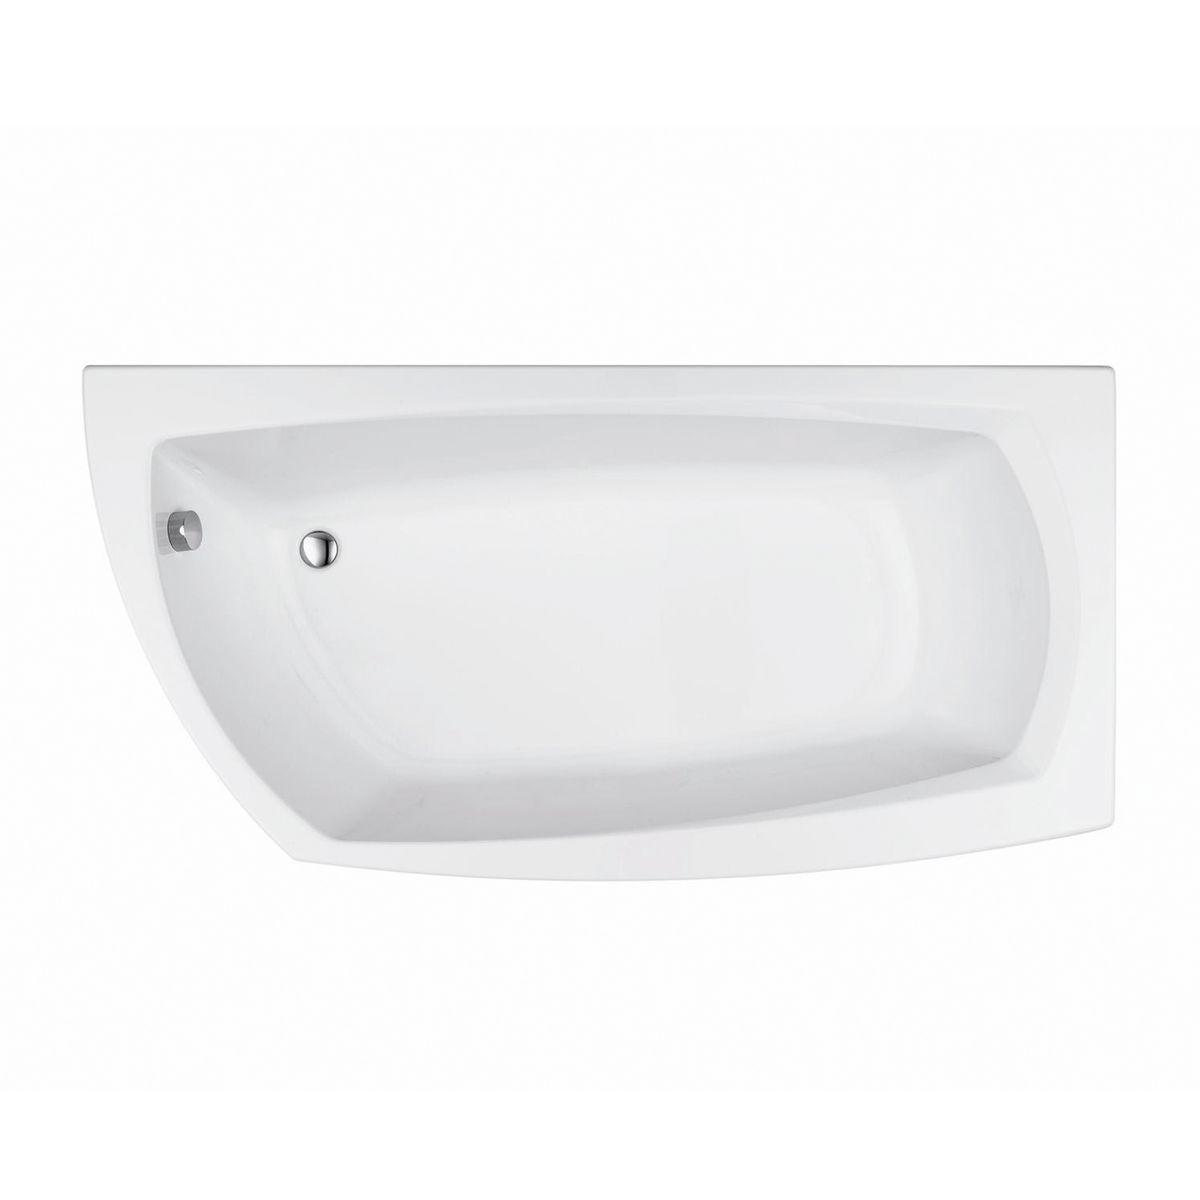 Vasca da bagno dimensioni minime fabulous bienaim dimensioni minime vasca da bagno good voci di - Vasca da bagno dimensioni minime ...